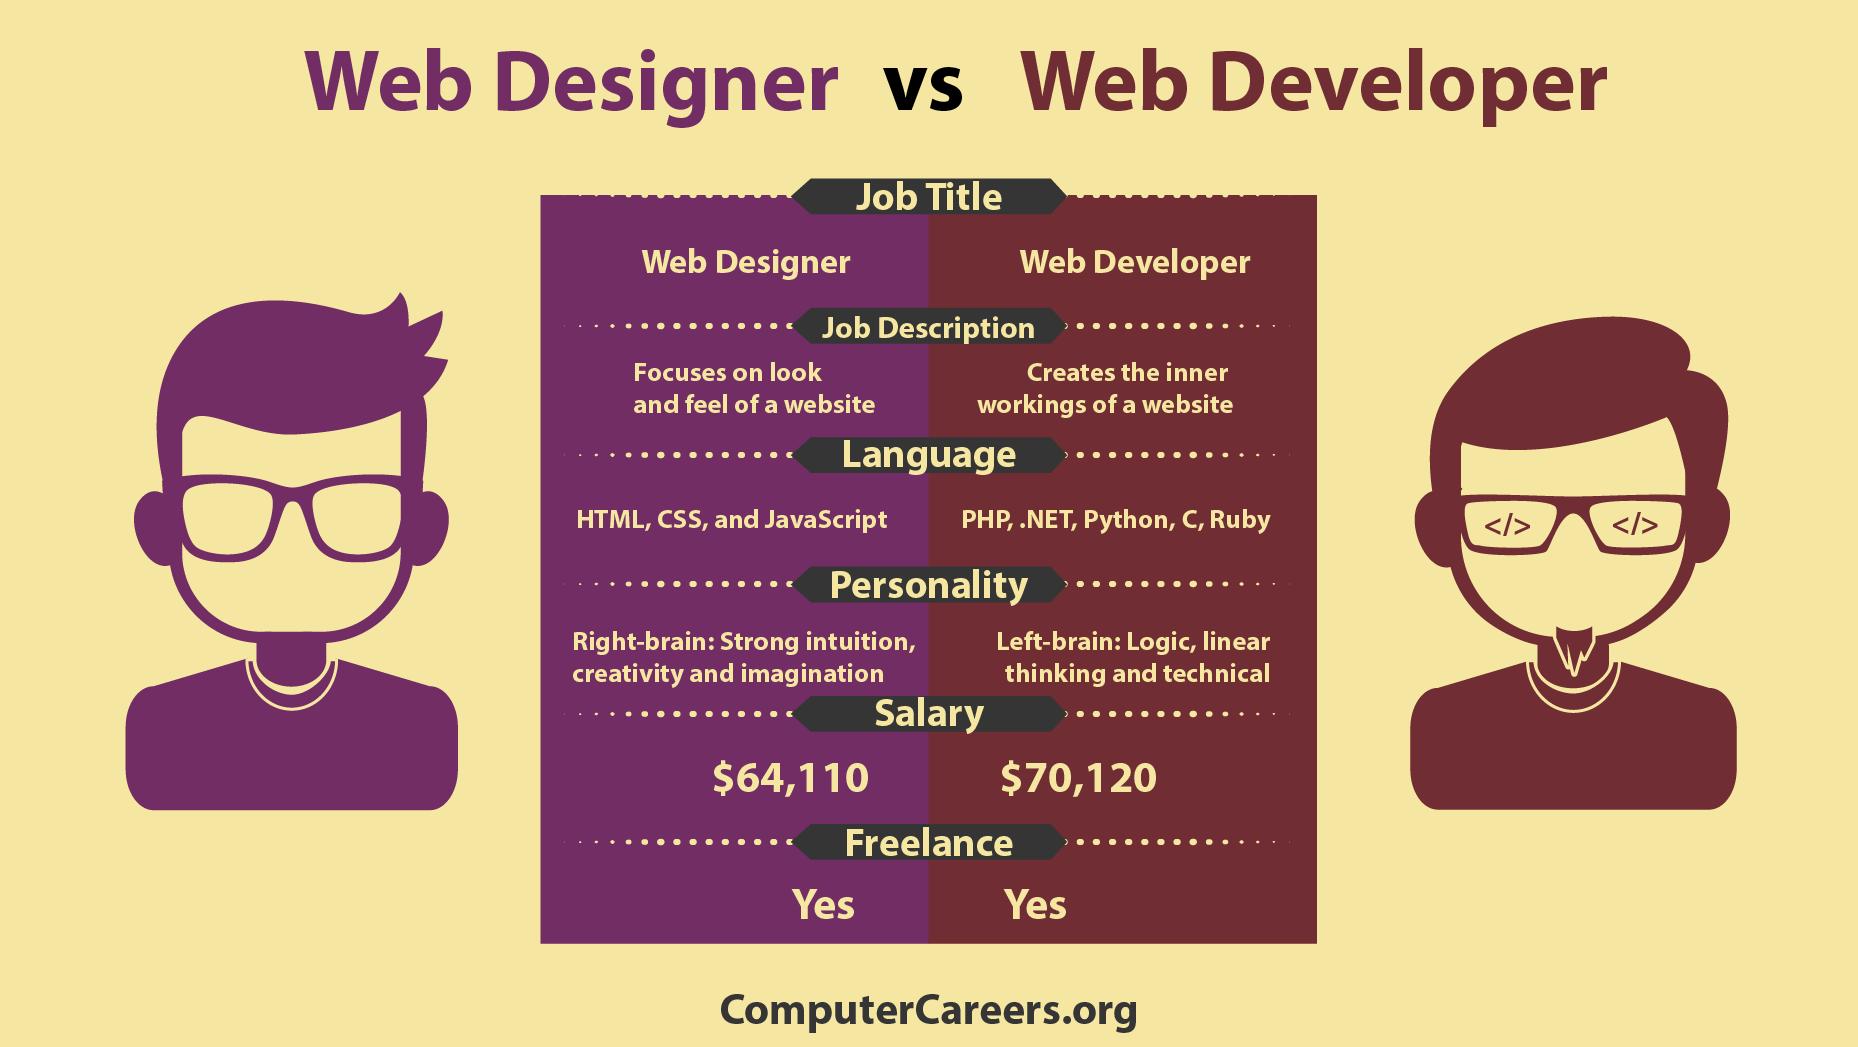 Infographic - Web Designer vs Web Developer